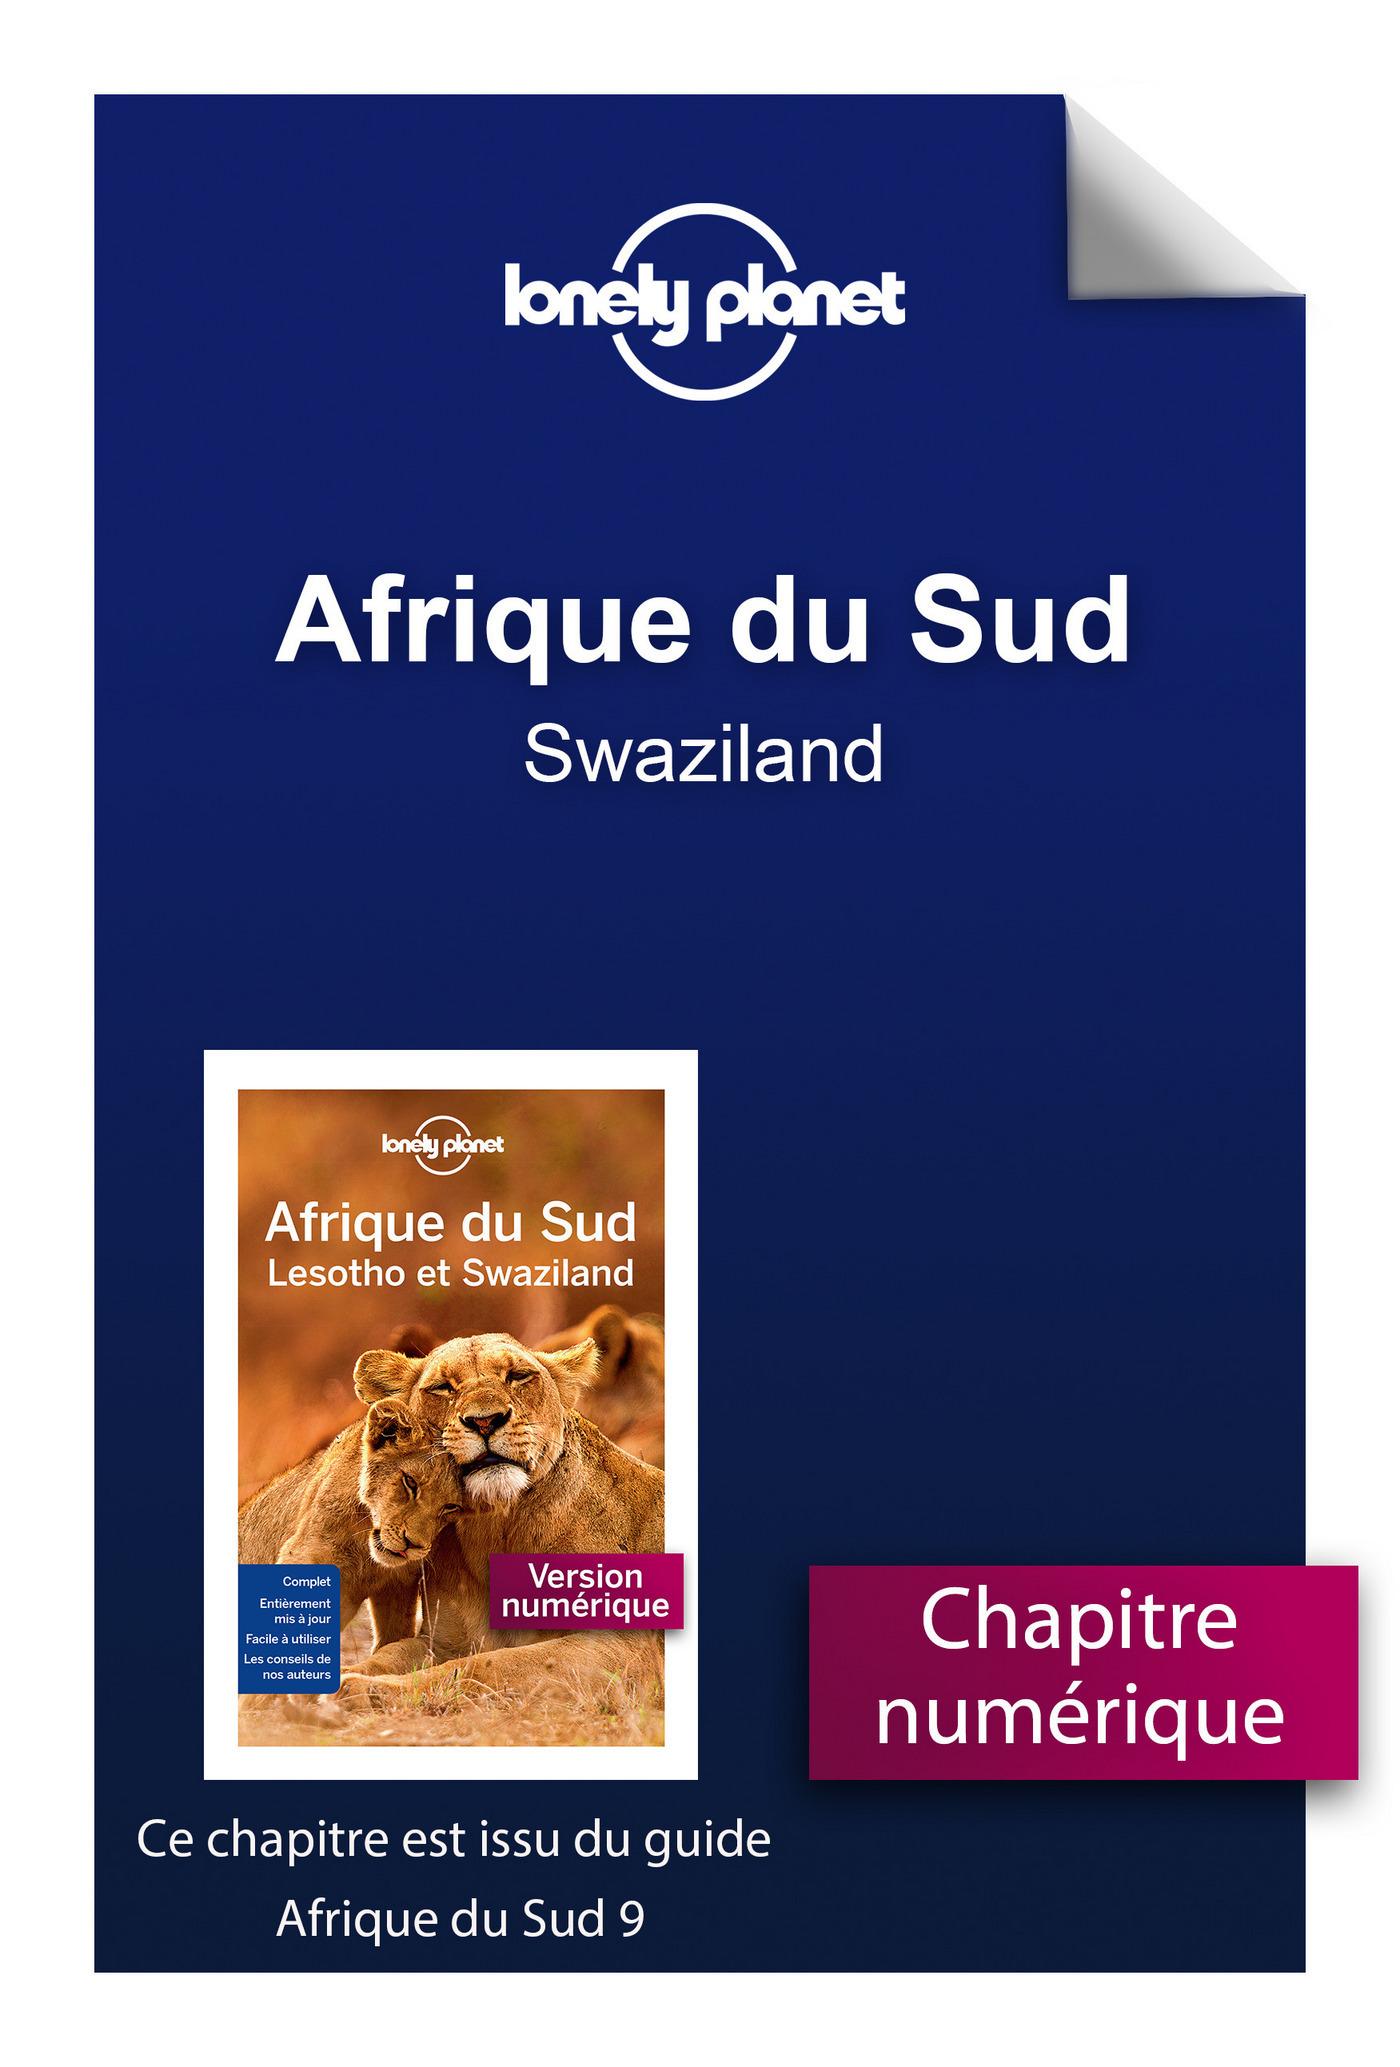 Afrique du Sud - Swaziland